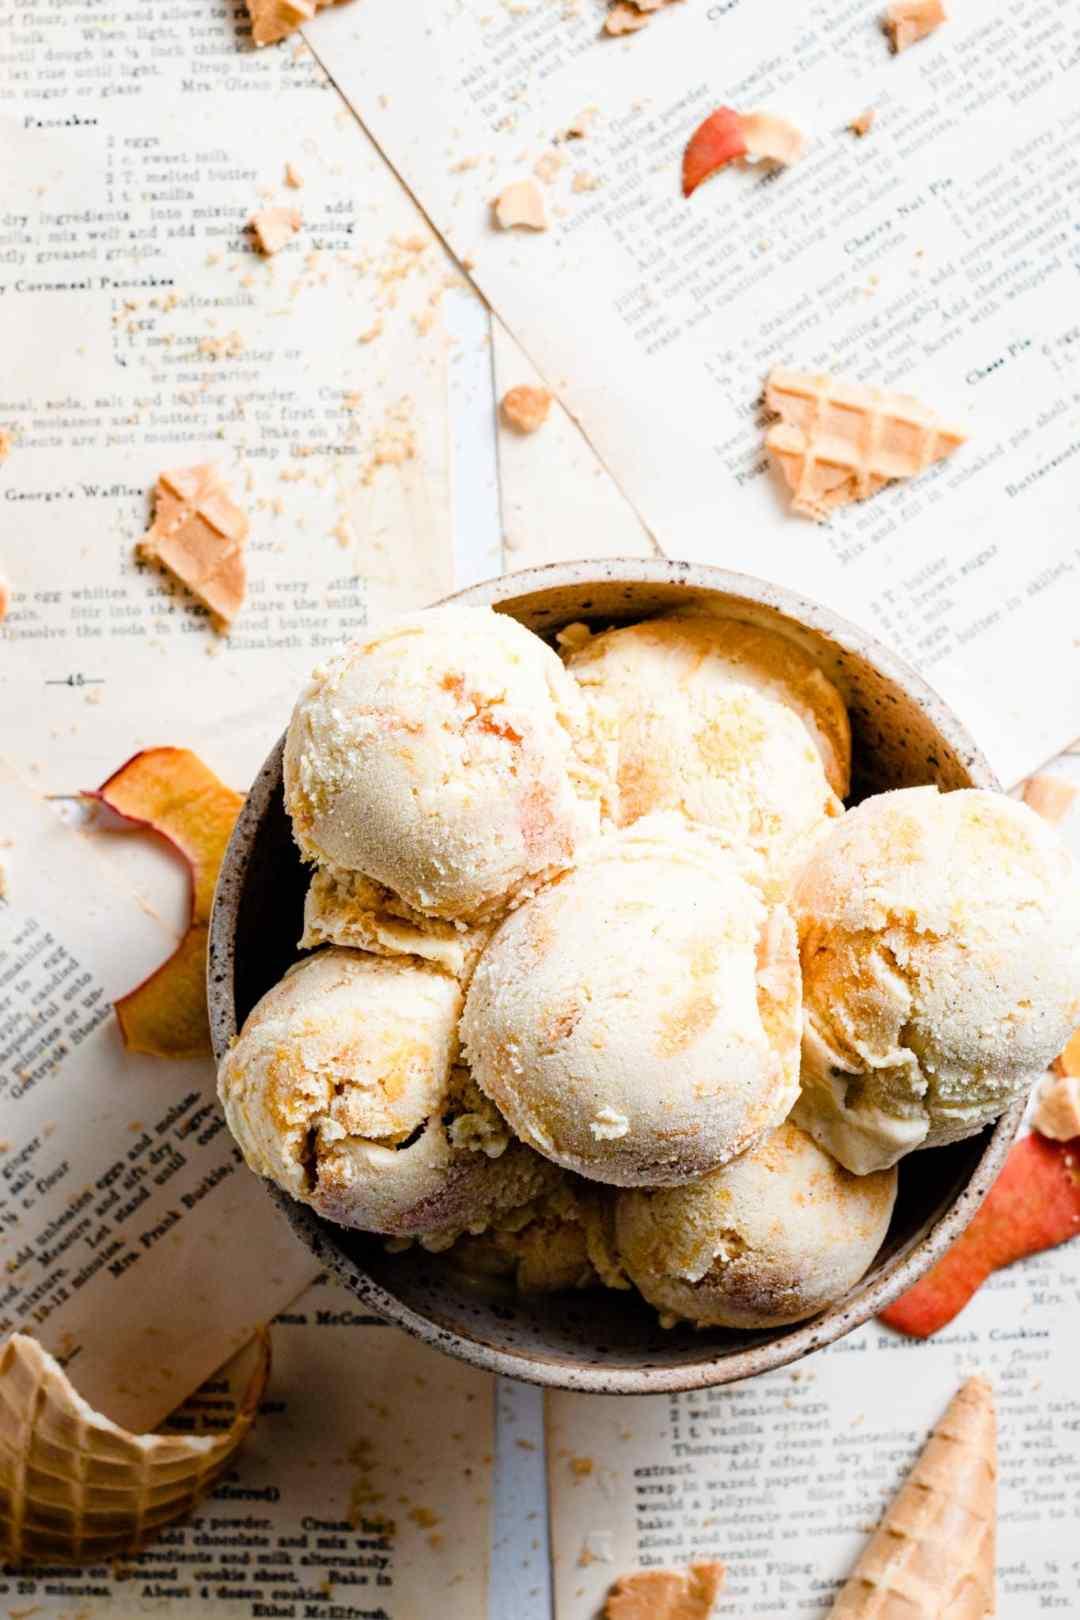 Peach ice cream scoops in a bowl.